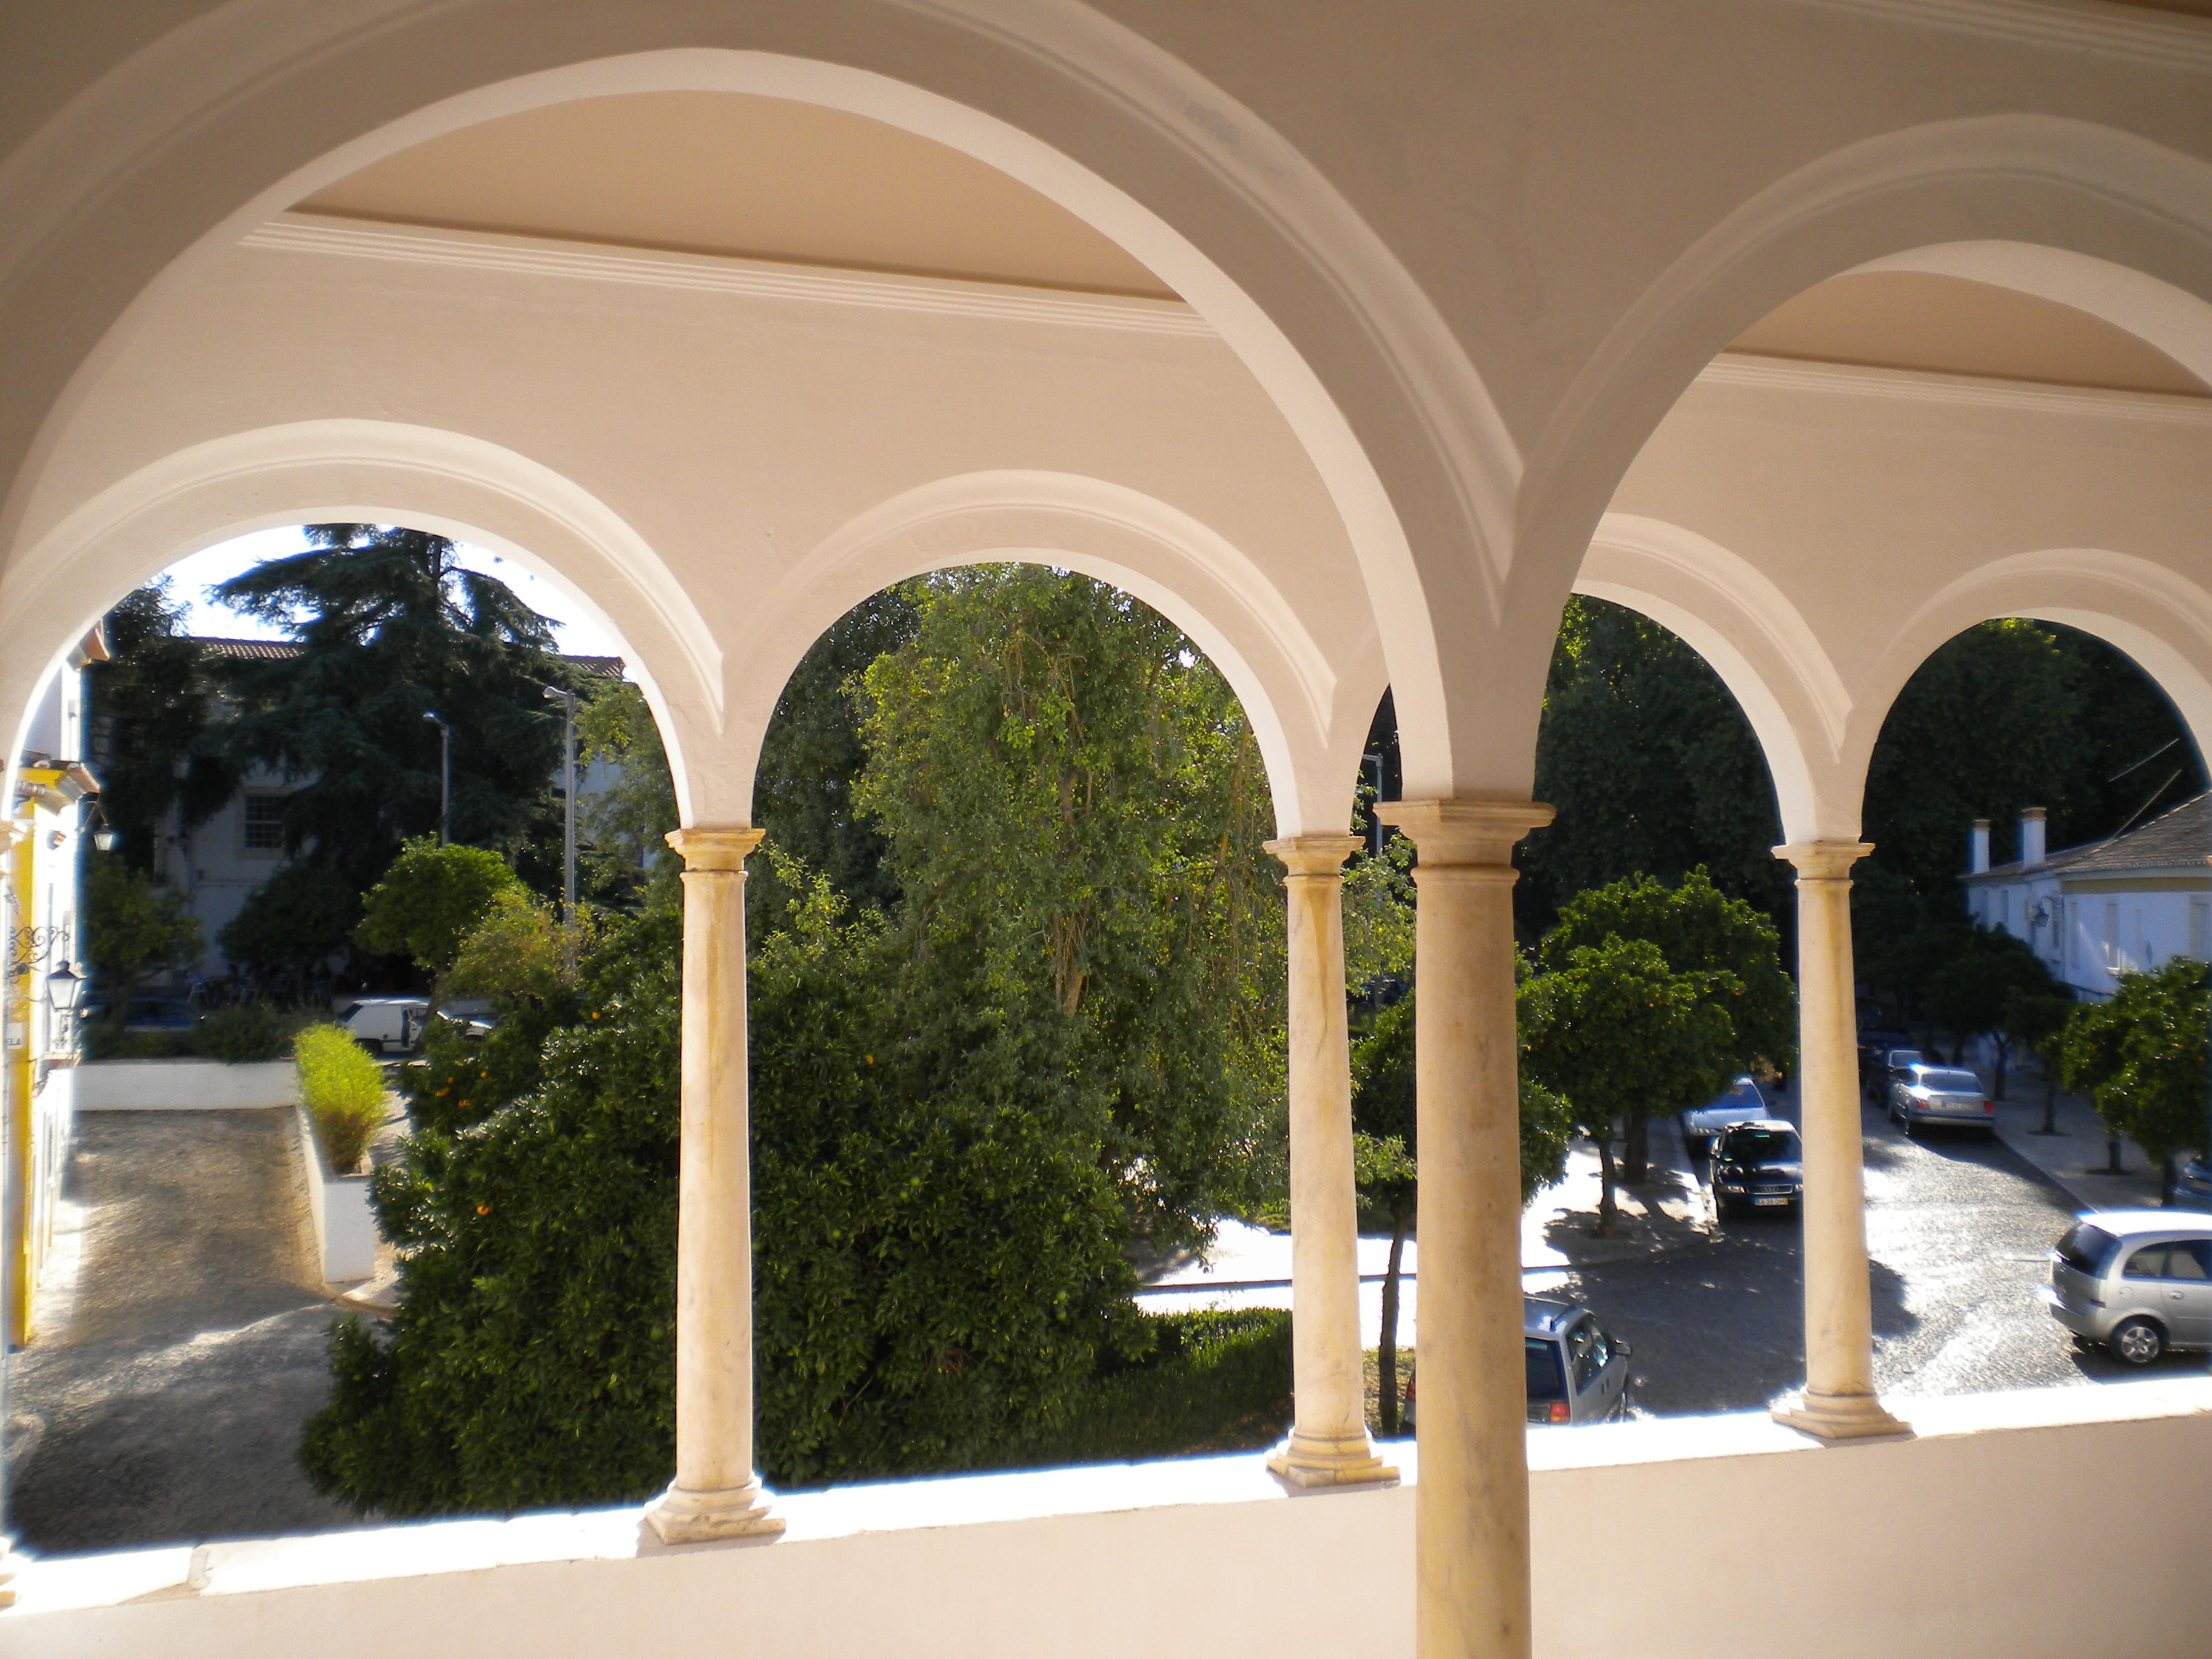 File palacio matos azambuja ou casa dos arcos vv jpg wikimedia commons - Hostel casa dos arcos ...